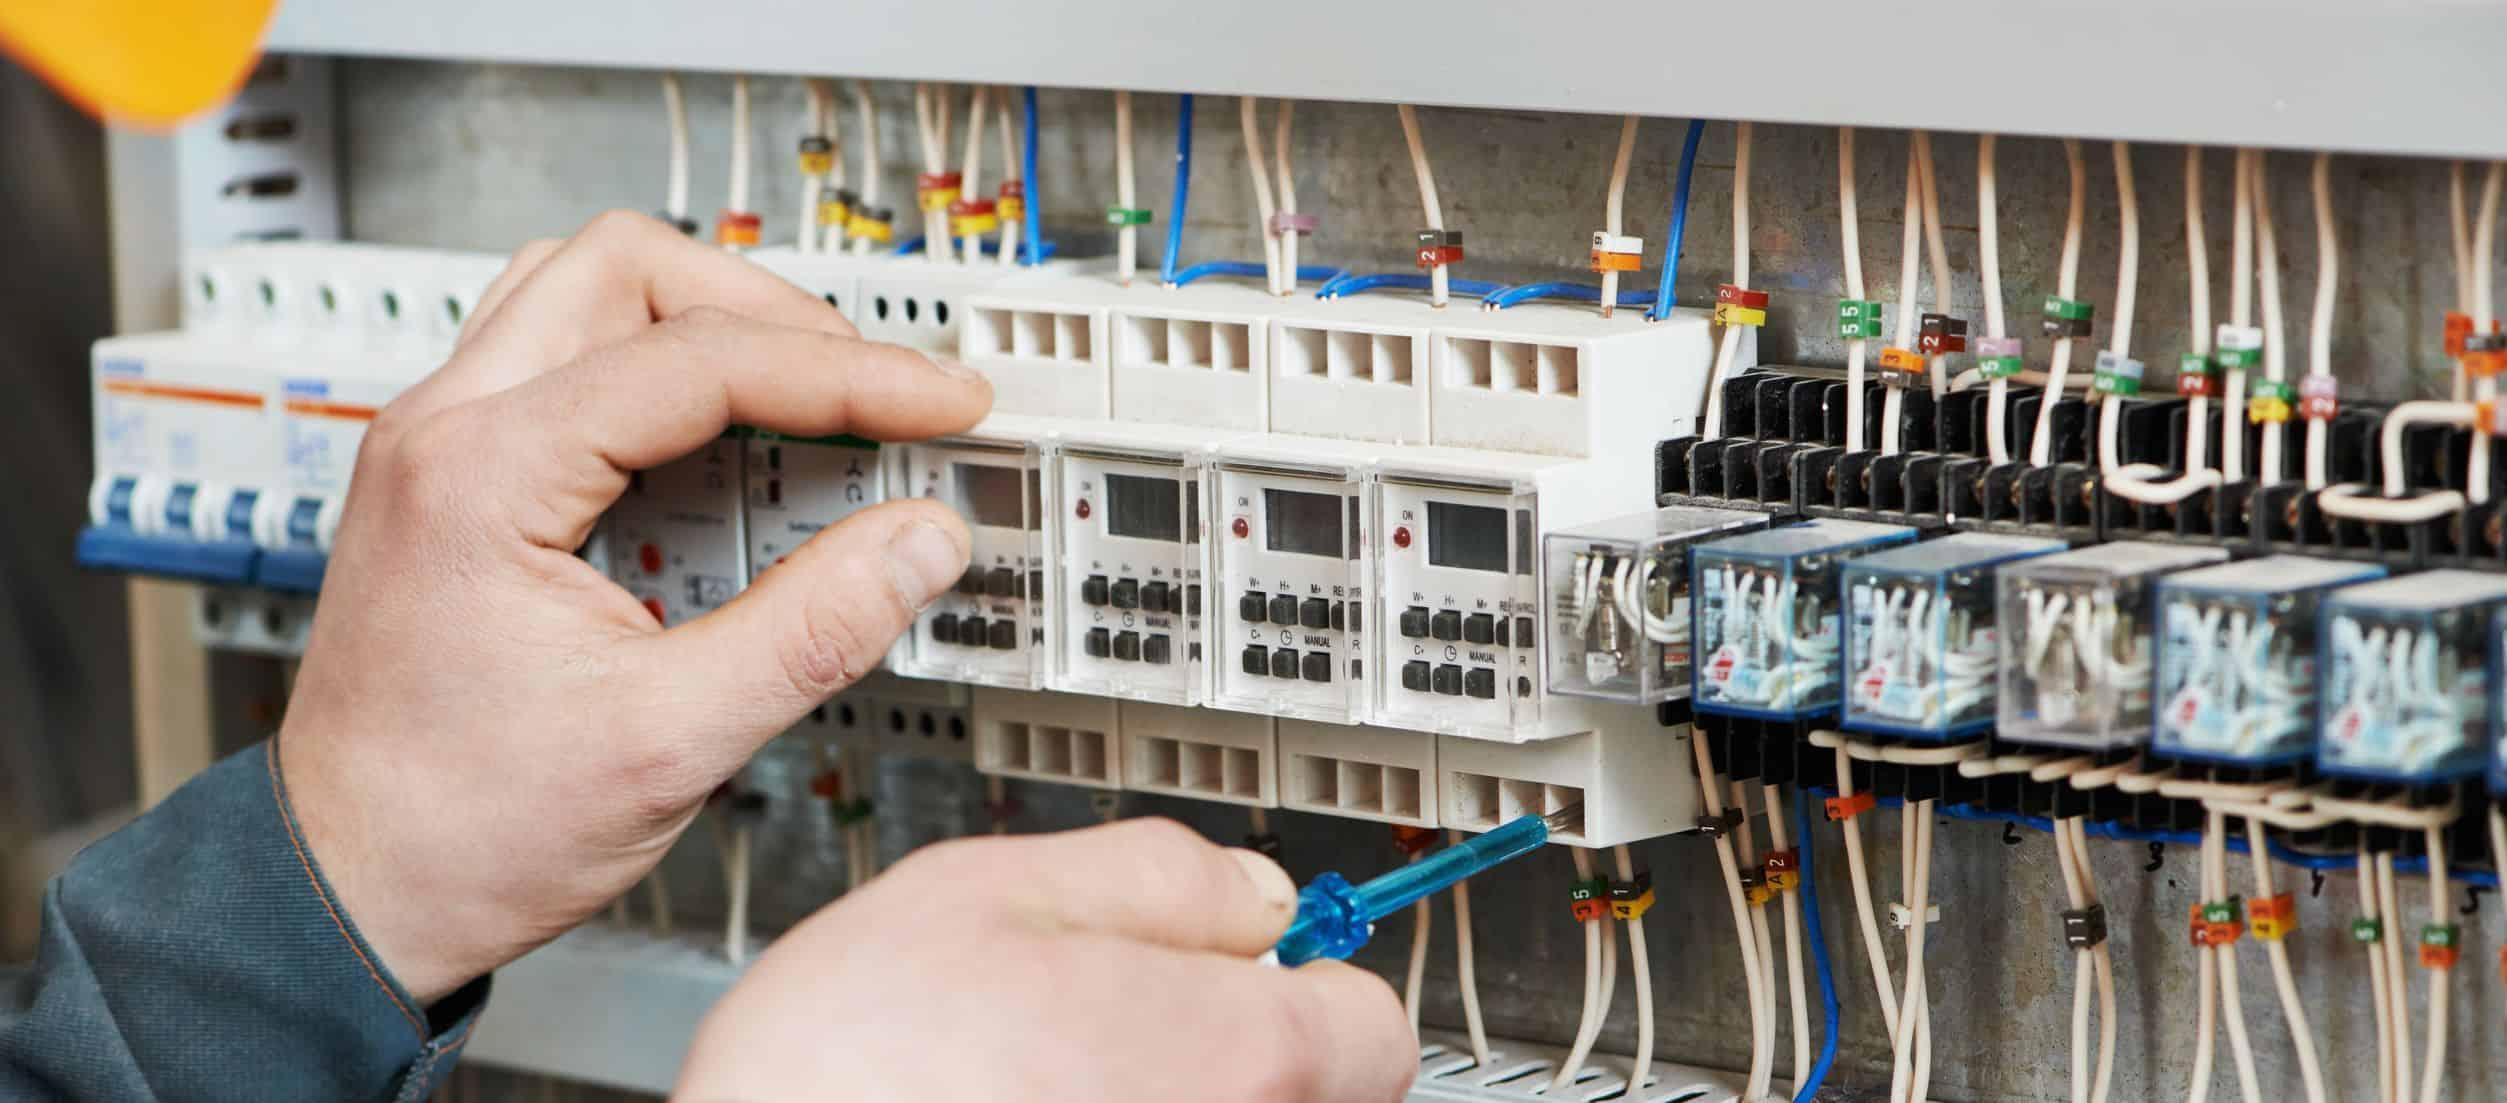 Elektromontážne práce